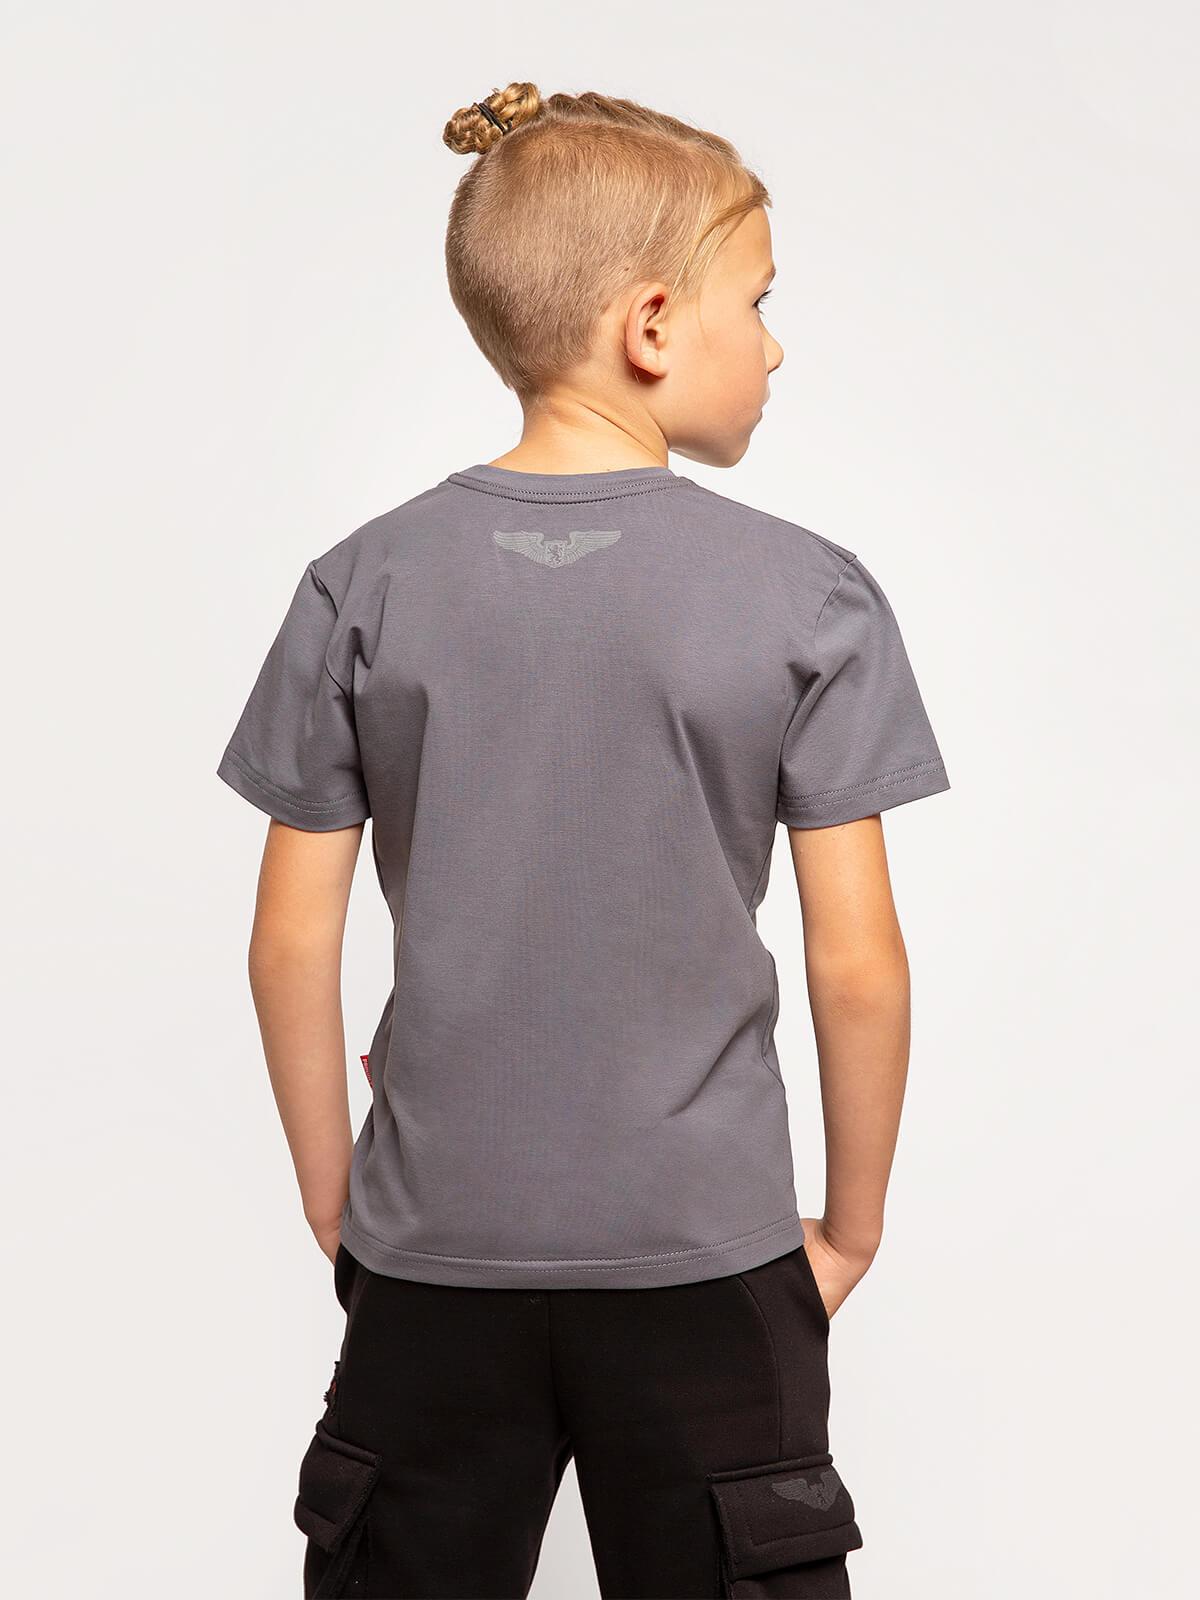 Kids T-Shirt Ukrainian Navy. Color dark gray.  Material: 95% cotton, 5% spandex.